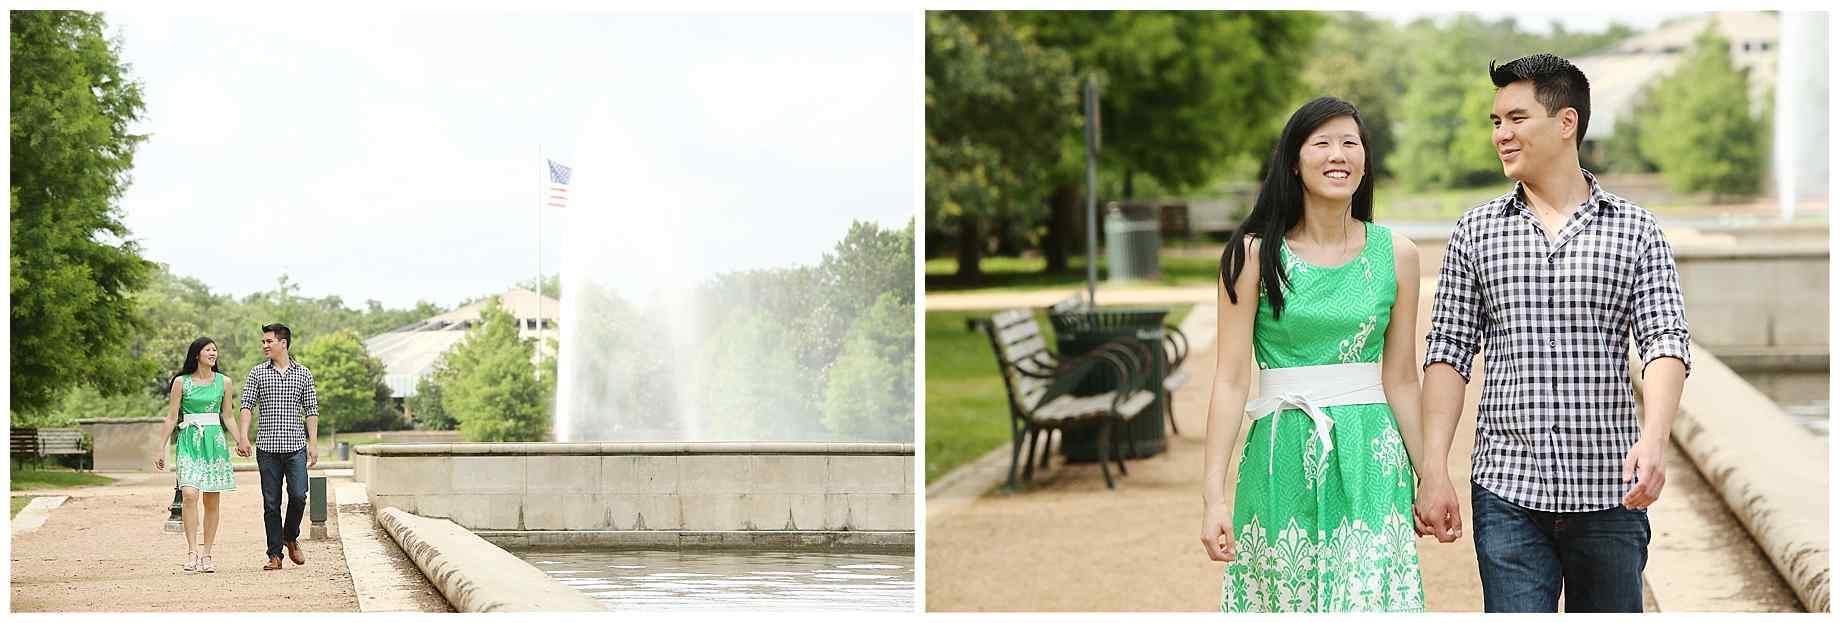 houston-herman-park-enagagement-photographers-001